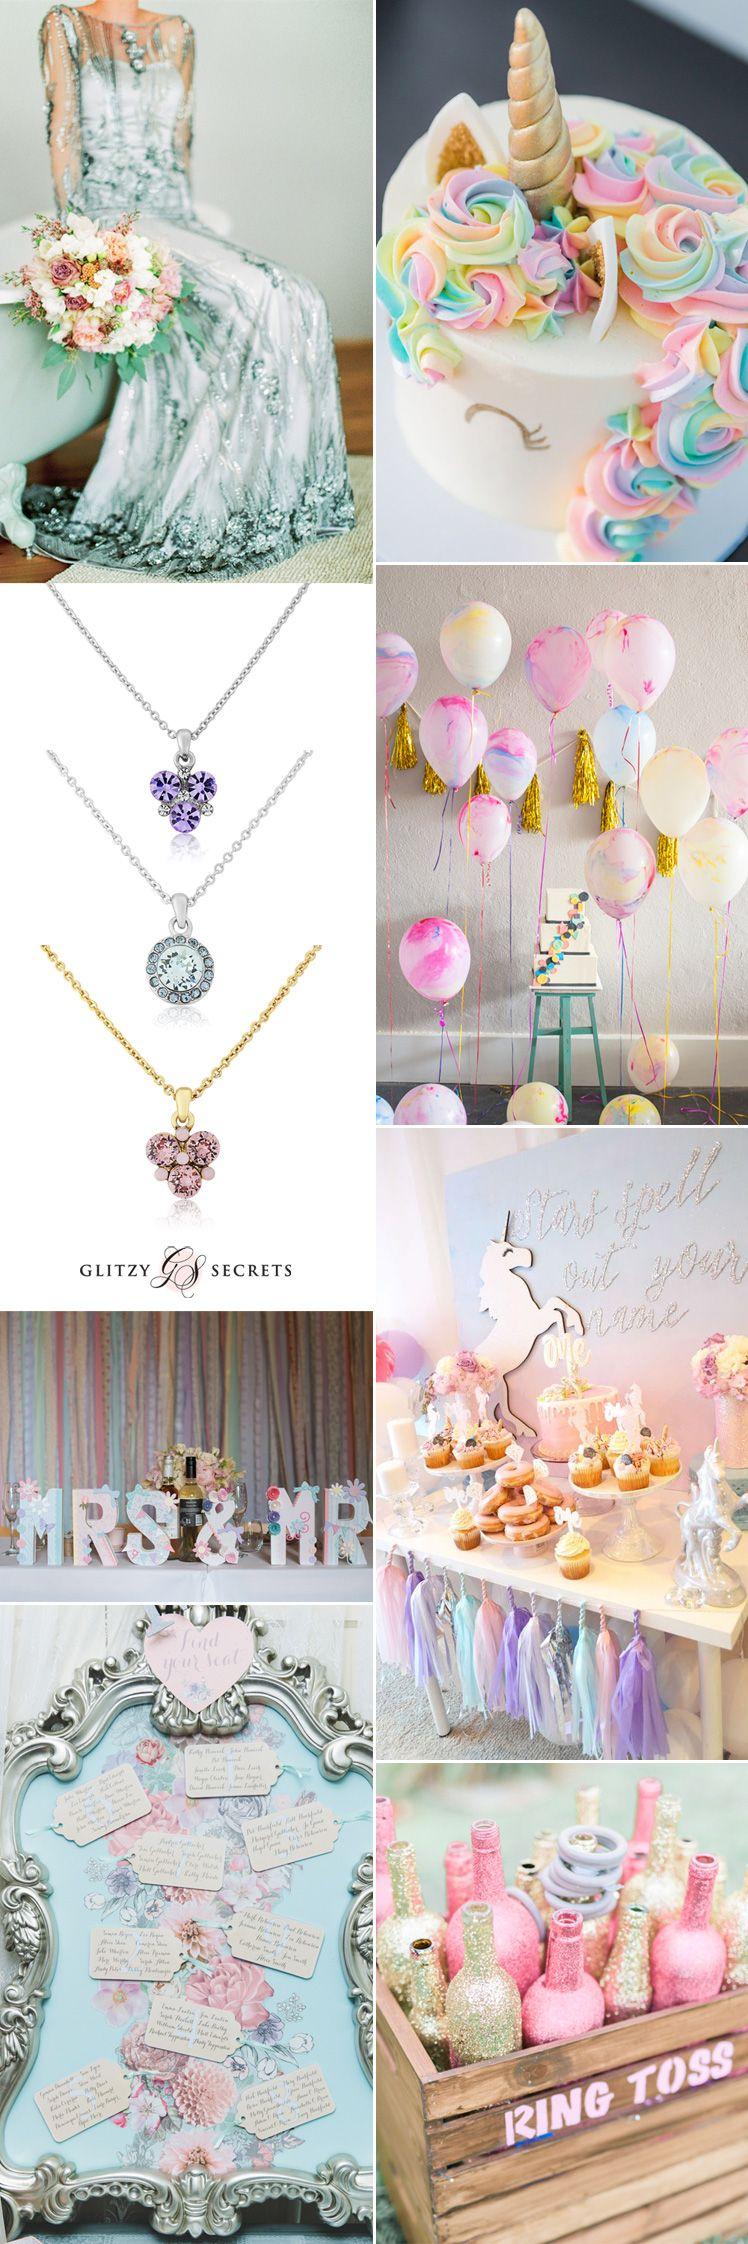 Magical Unicorn Wedding Ideas You\'ll Adore   Pinterest   Unicorns ...